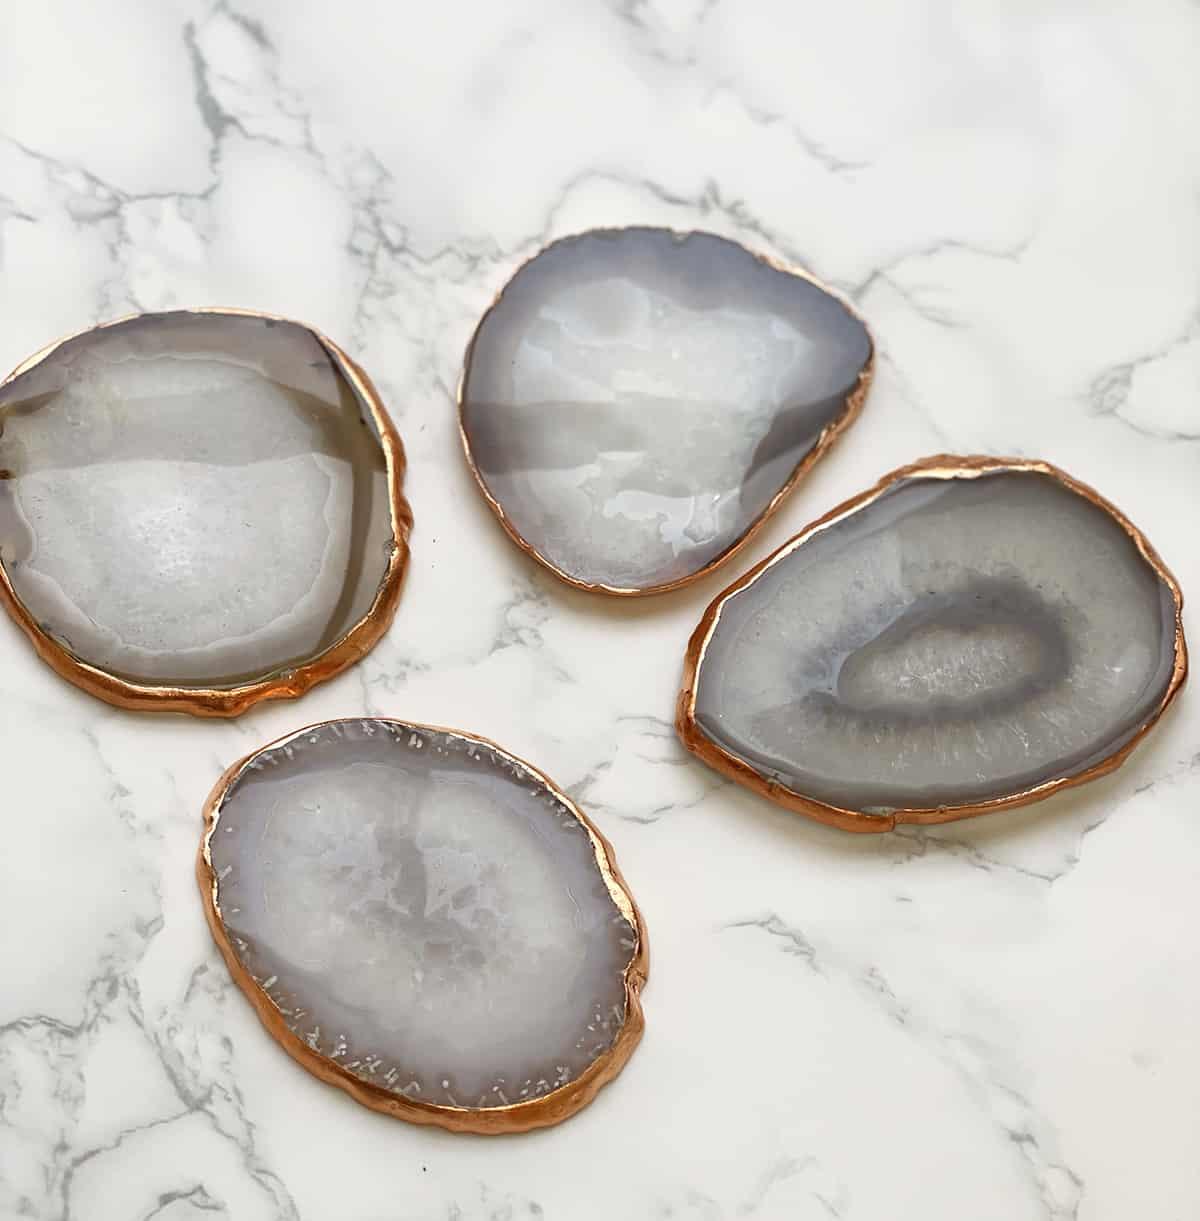 Porta-copos de cristal em mesa de mármore